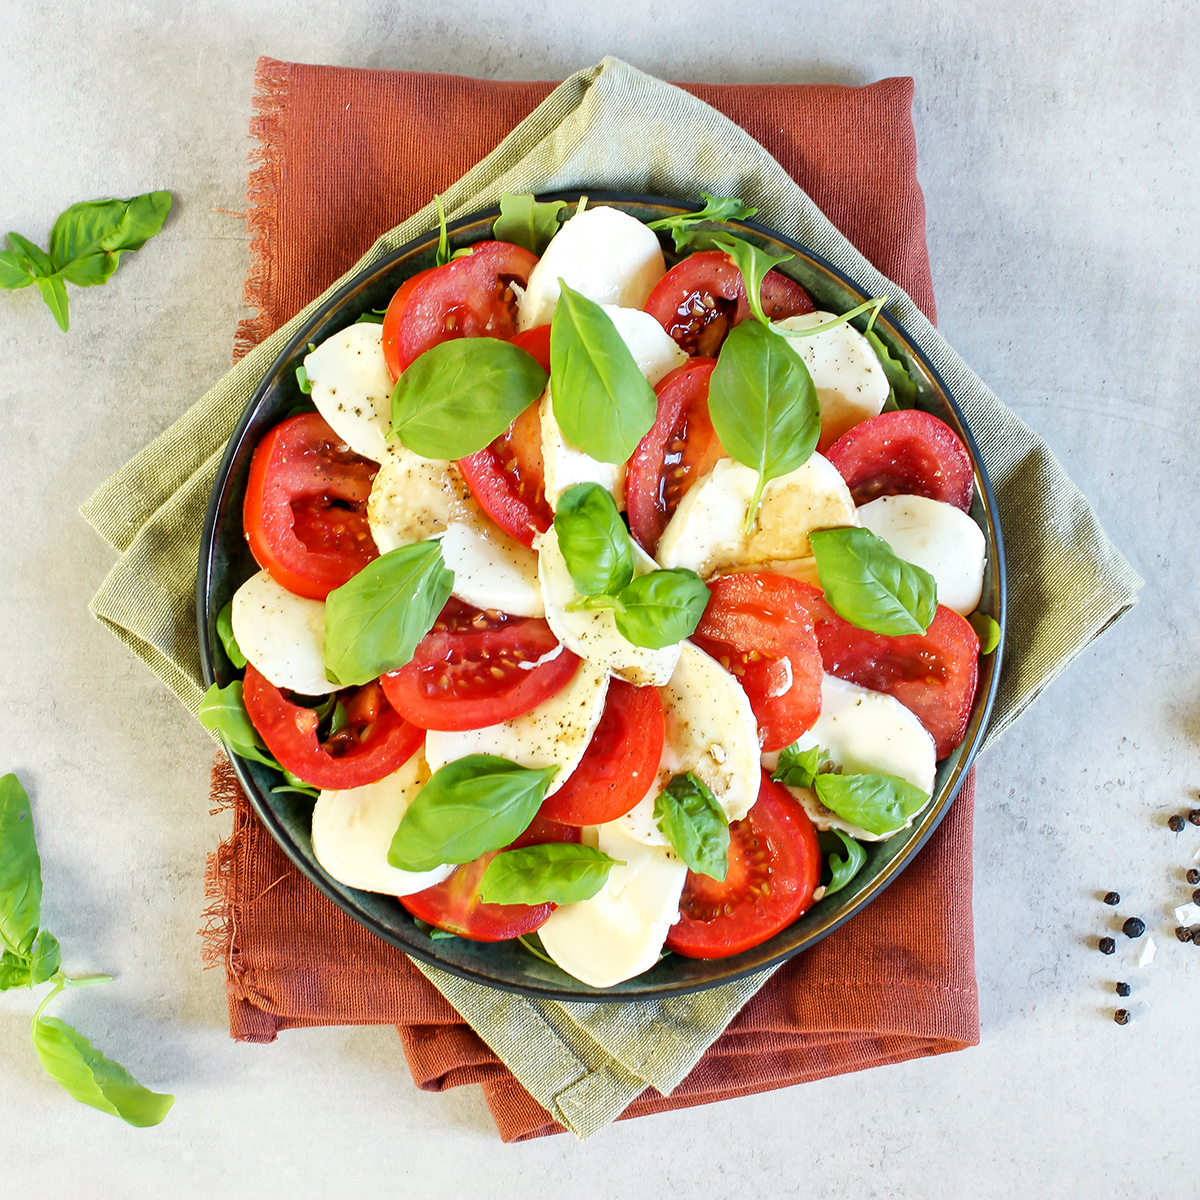 insalata caprese - tomat og mozzarellasalat